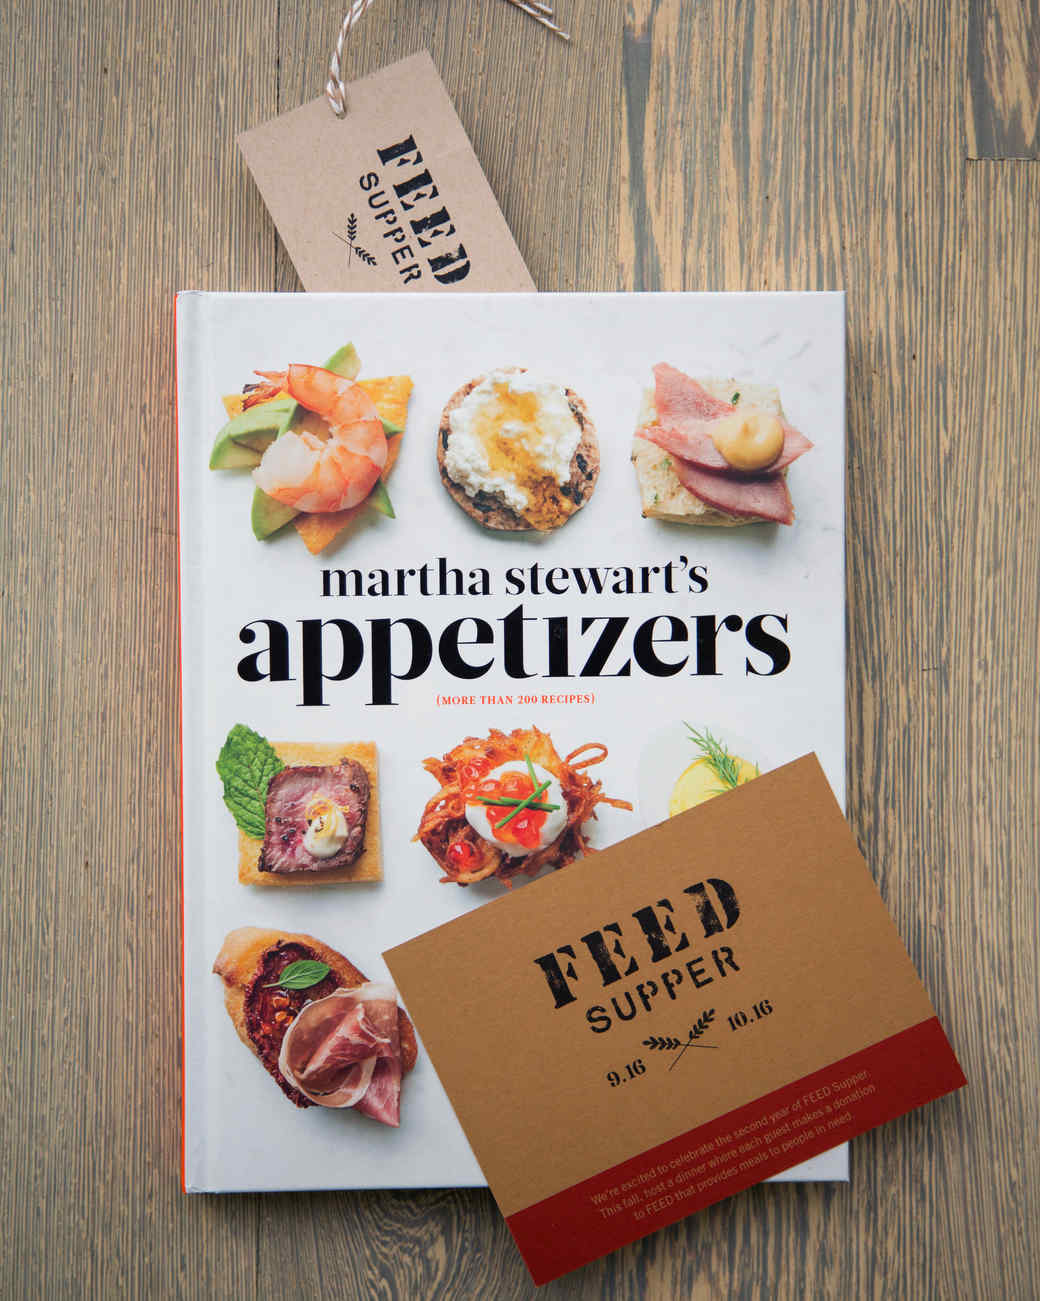 feed-supper-21-1015.jpg